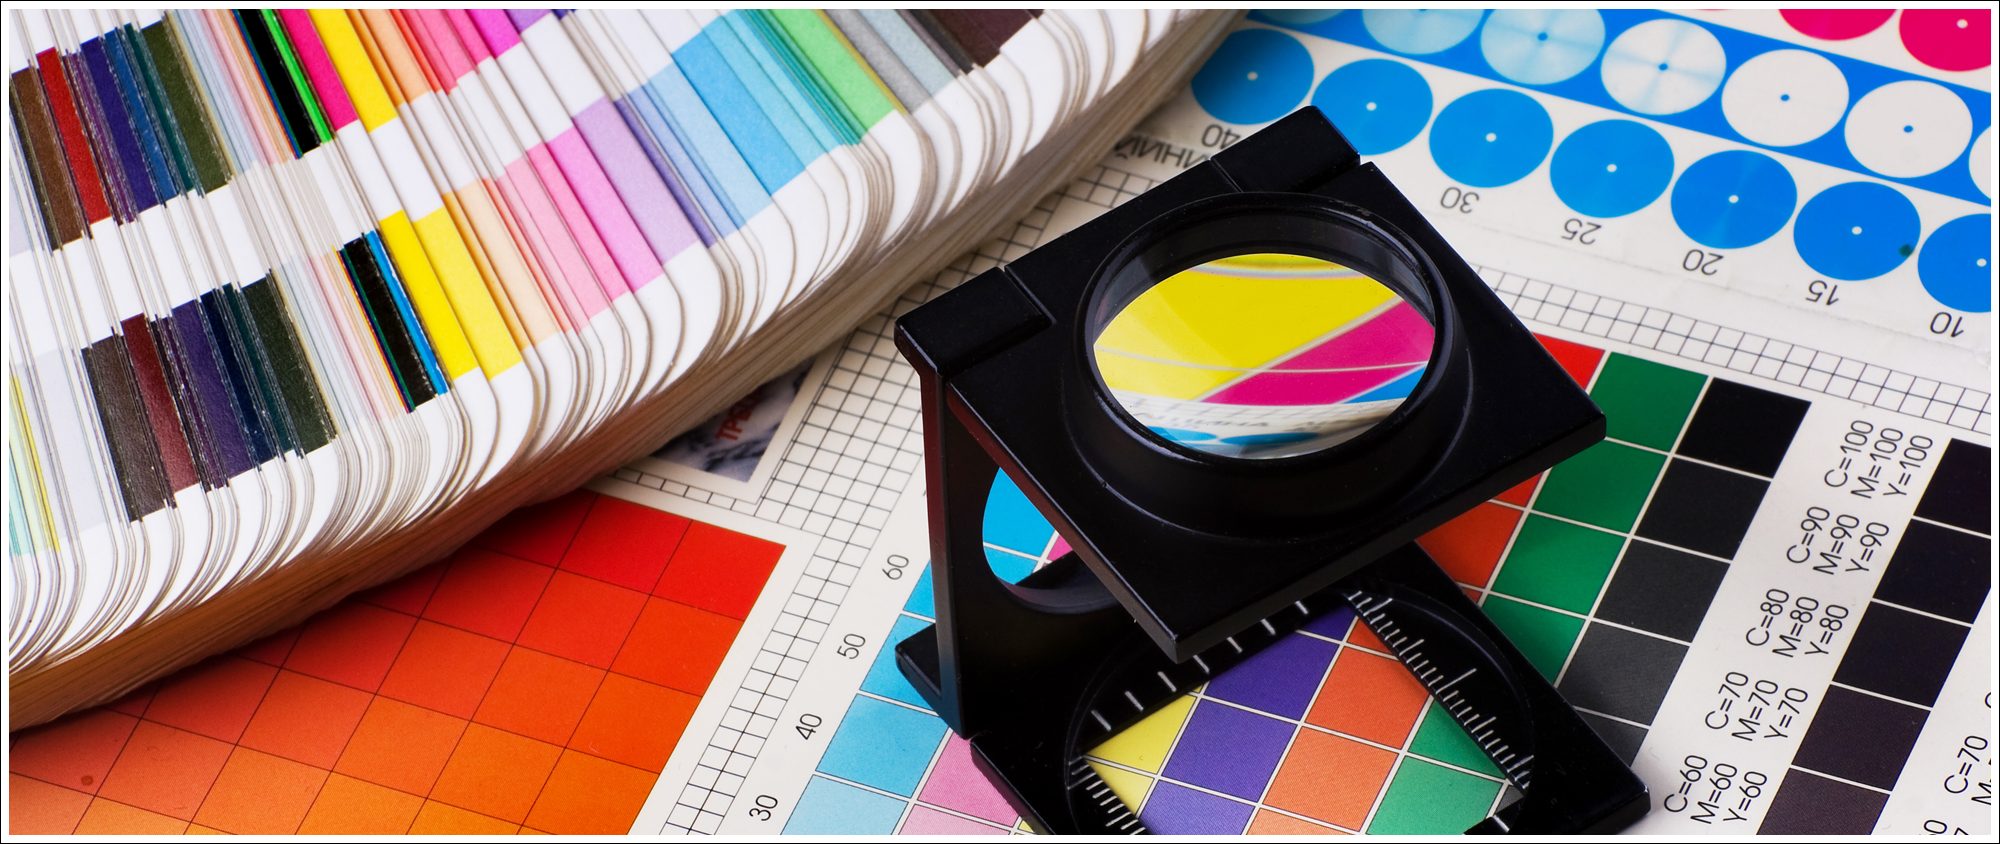 Digital vs Litho Printing | Premier Print UK - Fastest Printers in East Anglia!